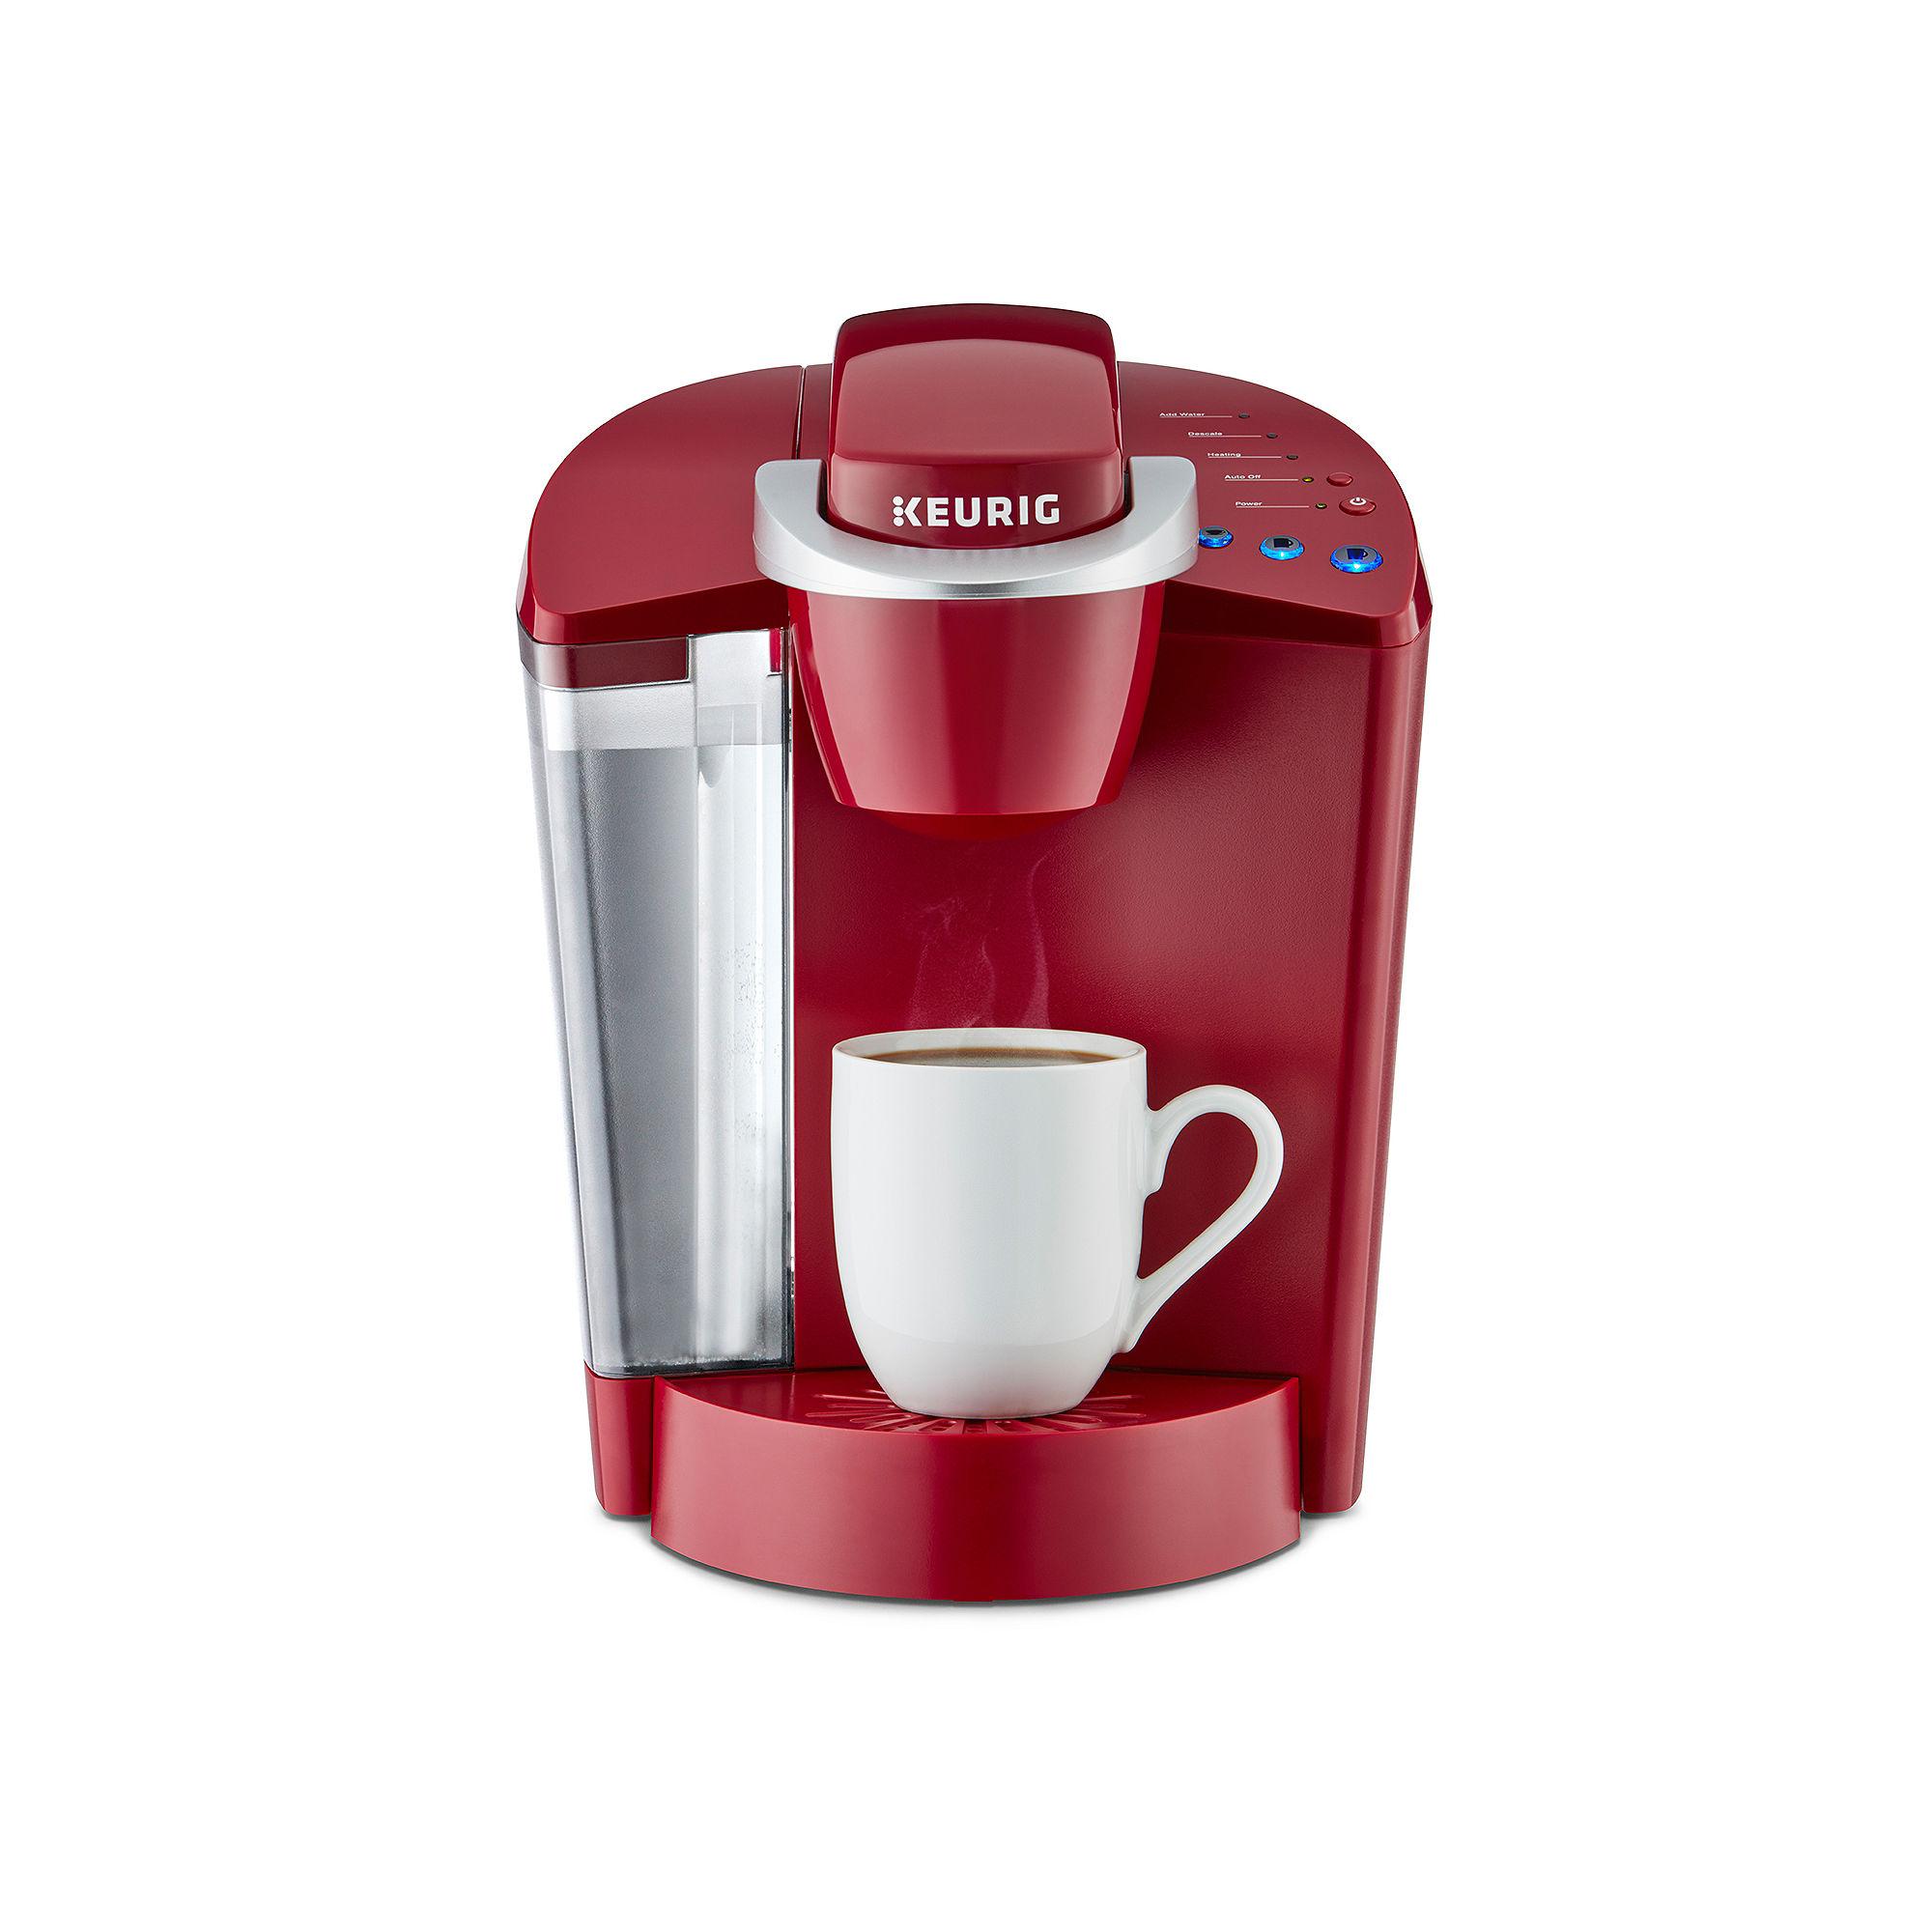 UPC 611247358986 - Keurig K55 Single-Serve Coffee Maker upcitemdb.com